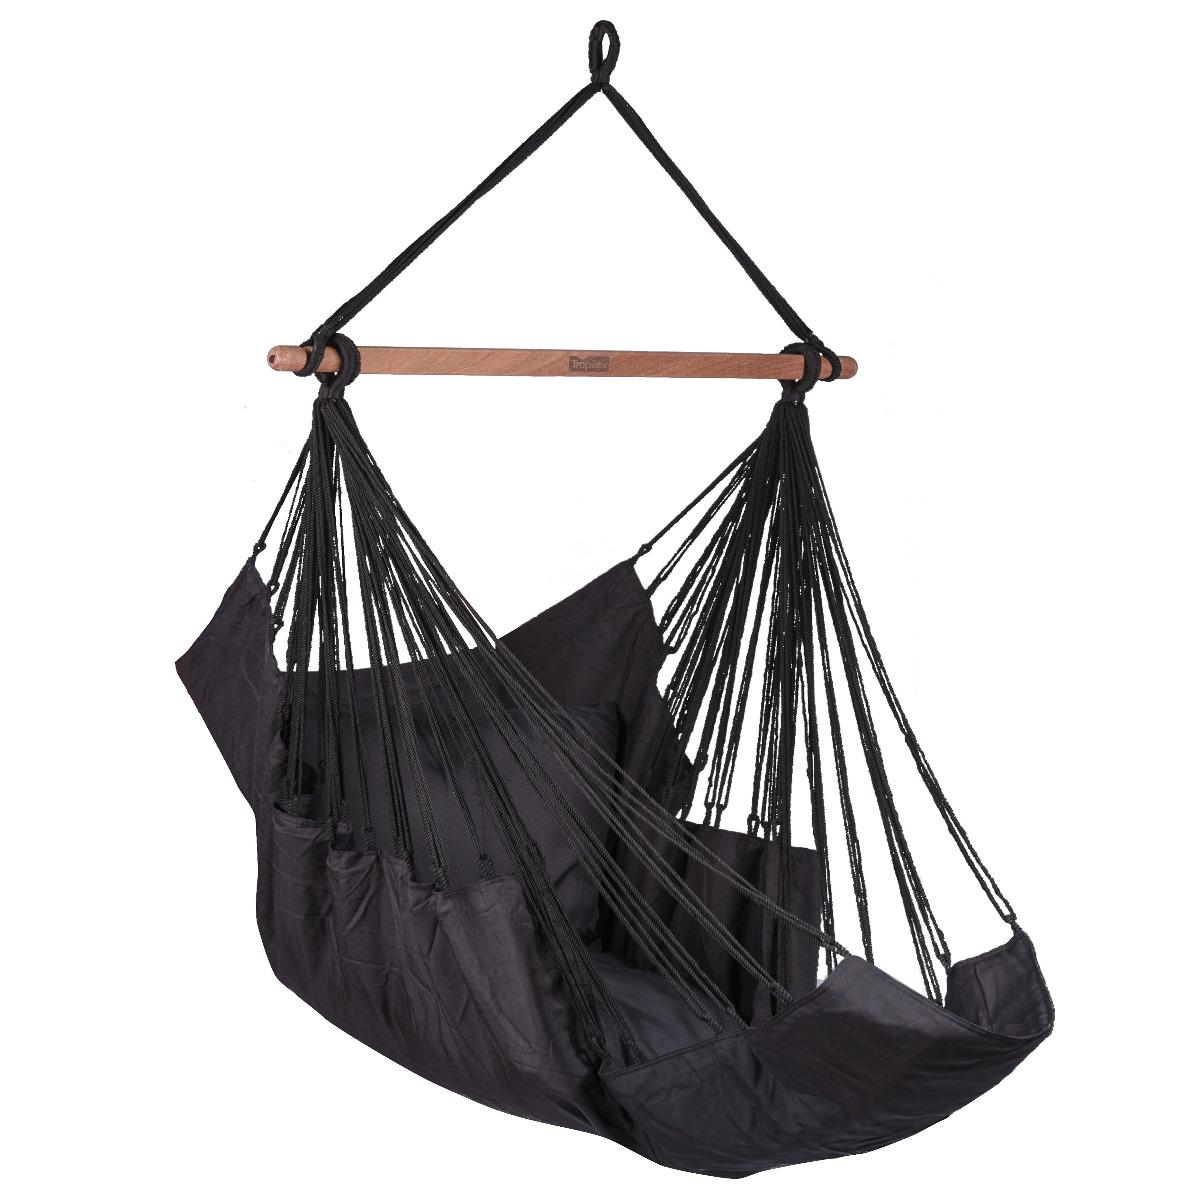 Hangstoel E�npersoons 'Sereno' Black - Zwart - Tropilex �